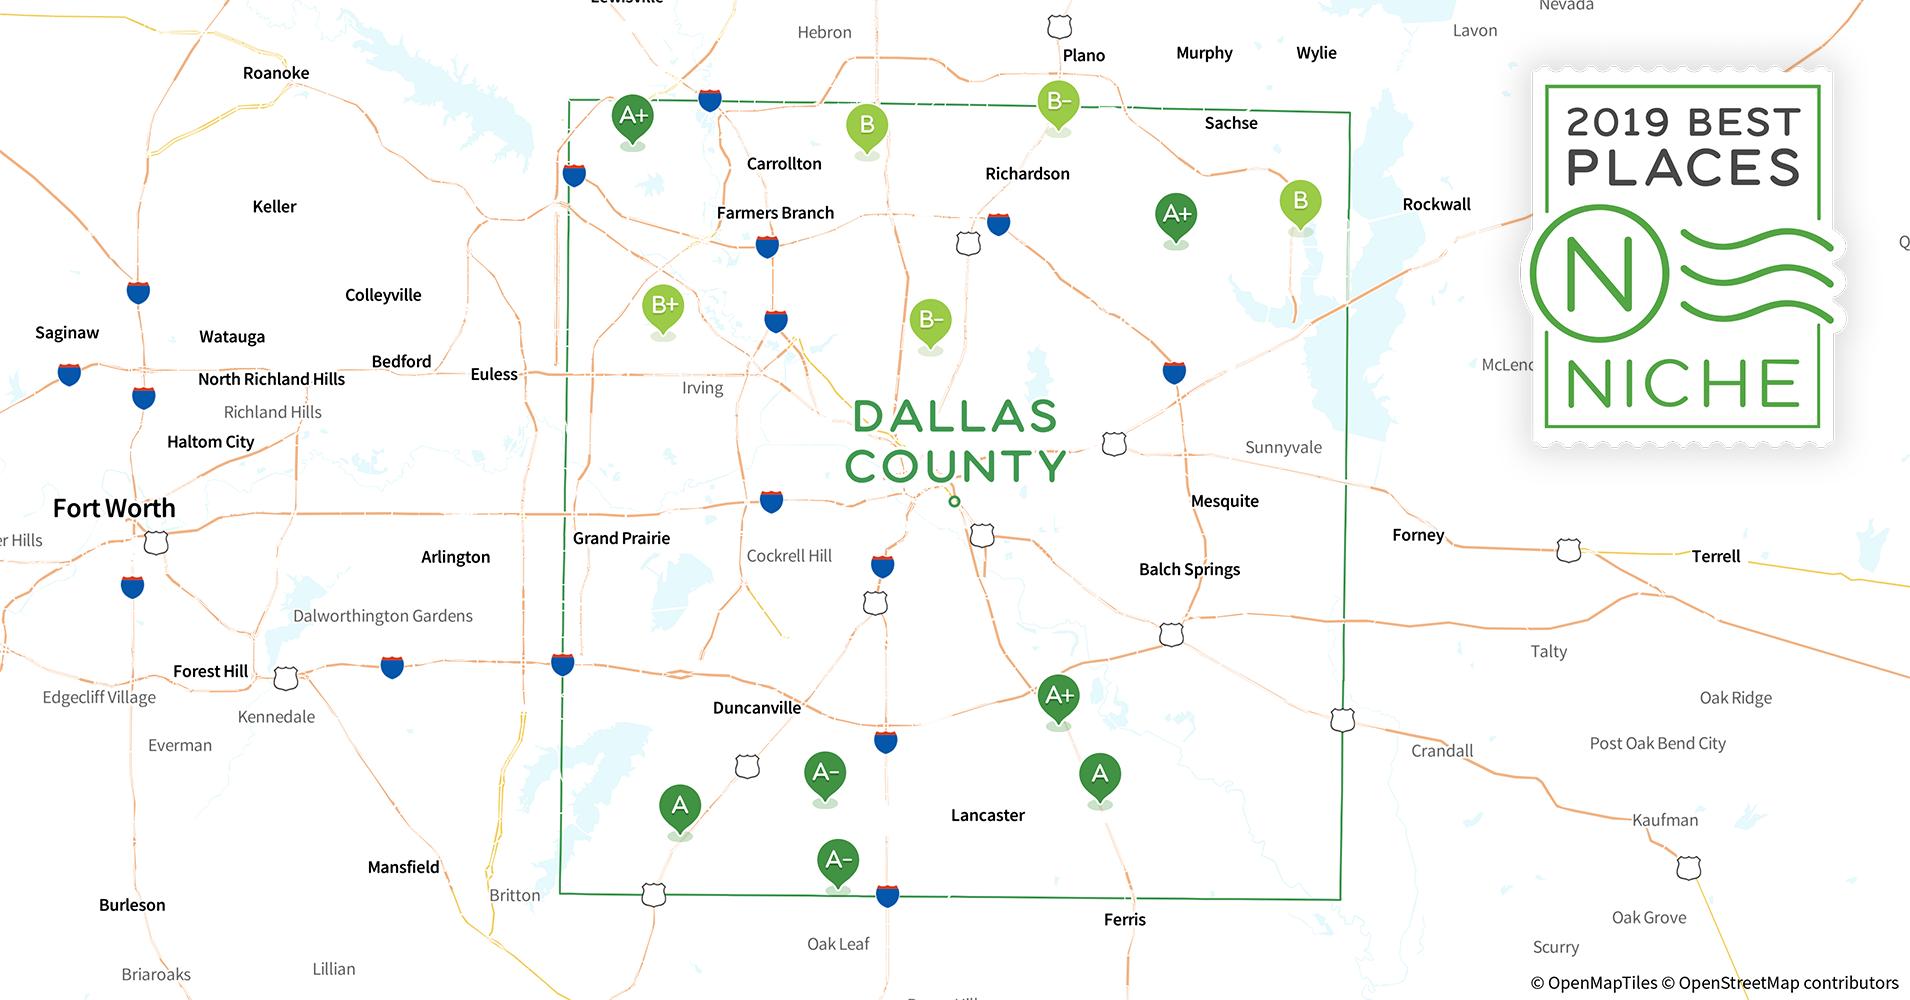 2019 Safe Places to Live in Dallas County, TX - Niche Dallas Va Map on dallas state map, dallas arlington map, dallas tx map, dallas usa map, dallas co map, dallas location on map, dallas area map, dallas pa map, dallas ga, dallas wv map, dallas nc map, dallas or map, dallas vamc map, dallas california map, dallas texas map clip art, dallas florida map, veterans administration hospital temple texas map, dallas washington map, dallas eu map, dallas sd map,